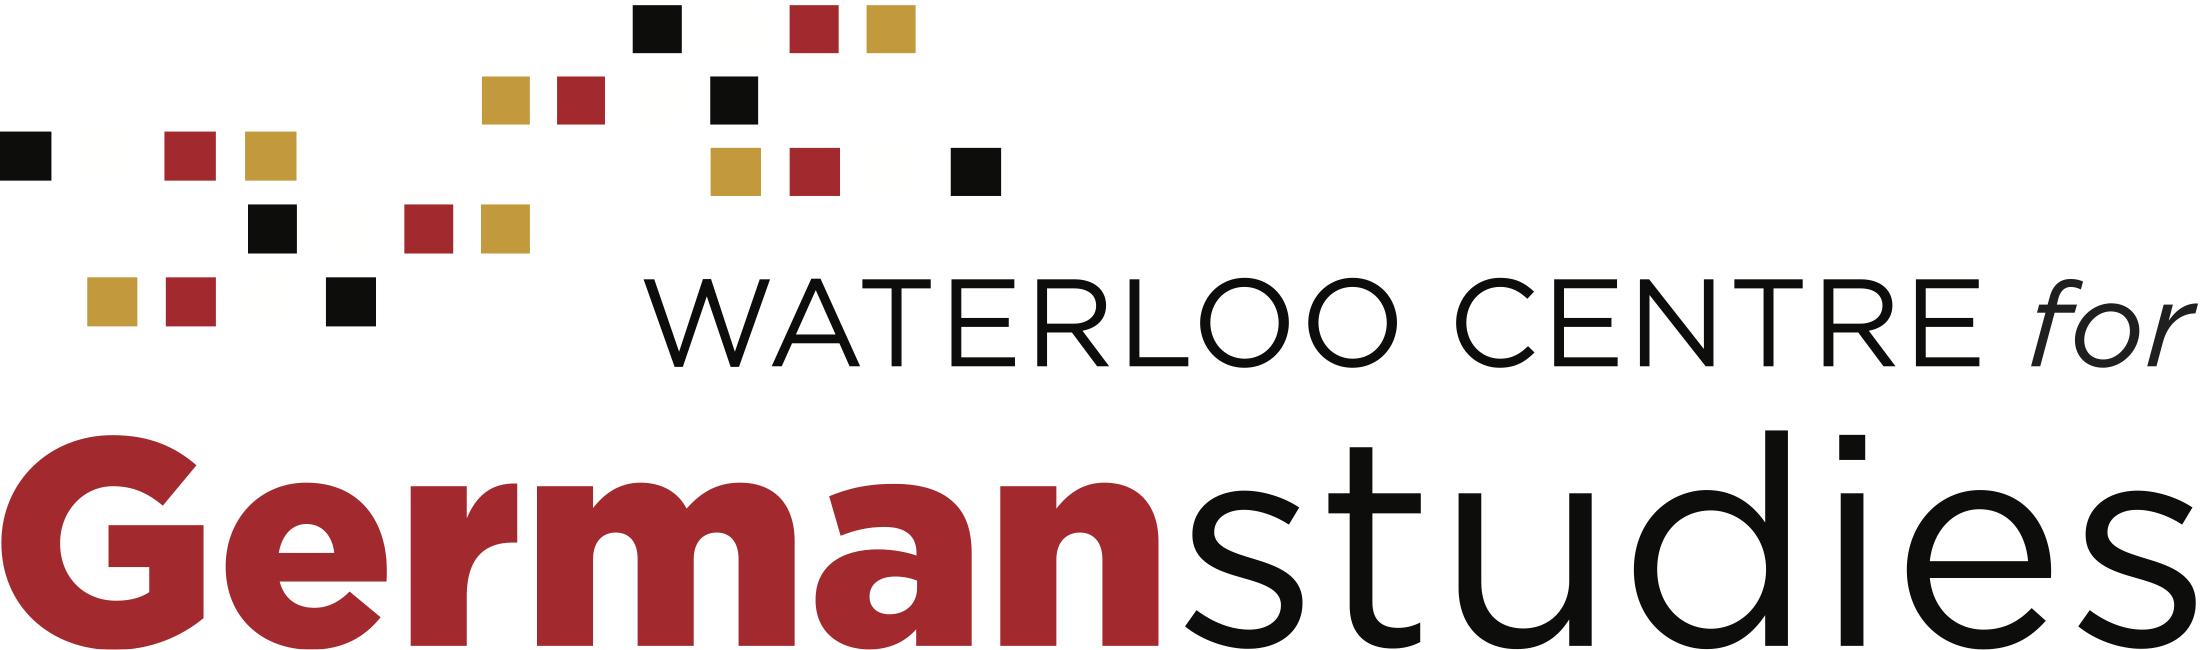 Waterloo Centre for German Studies logo